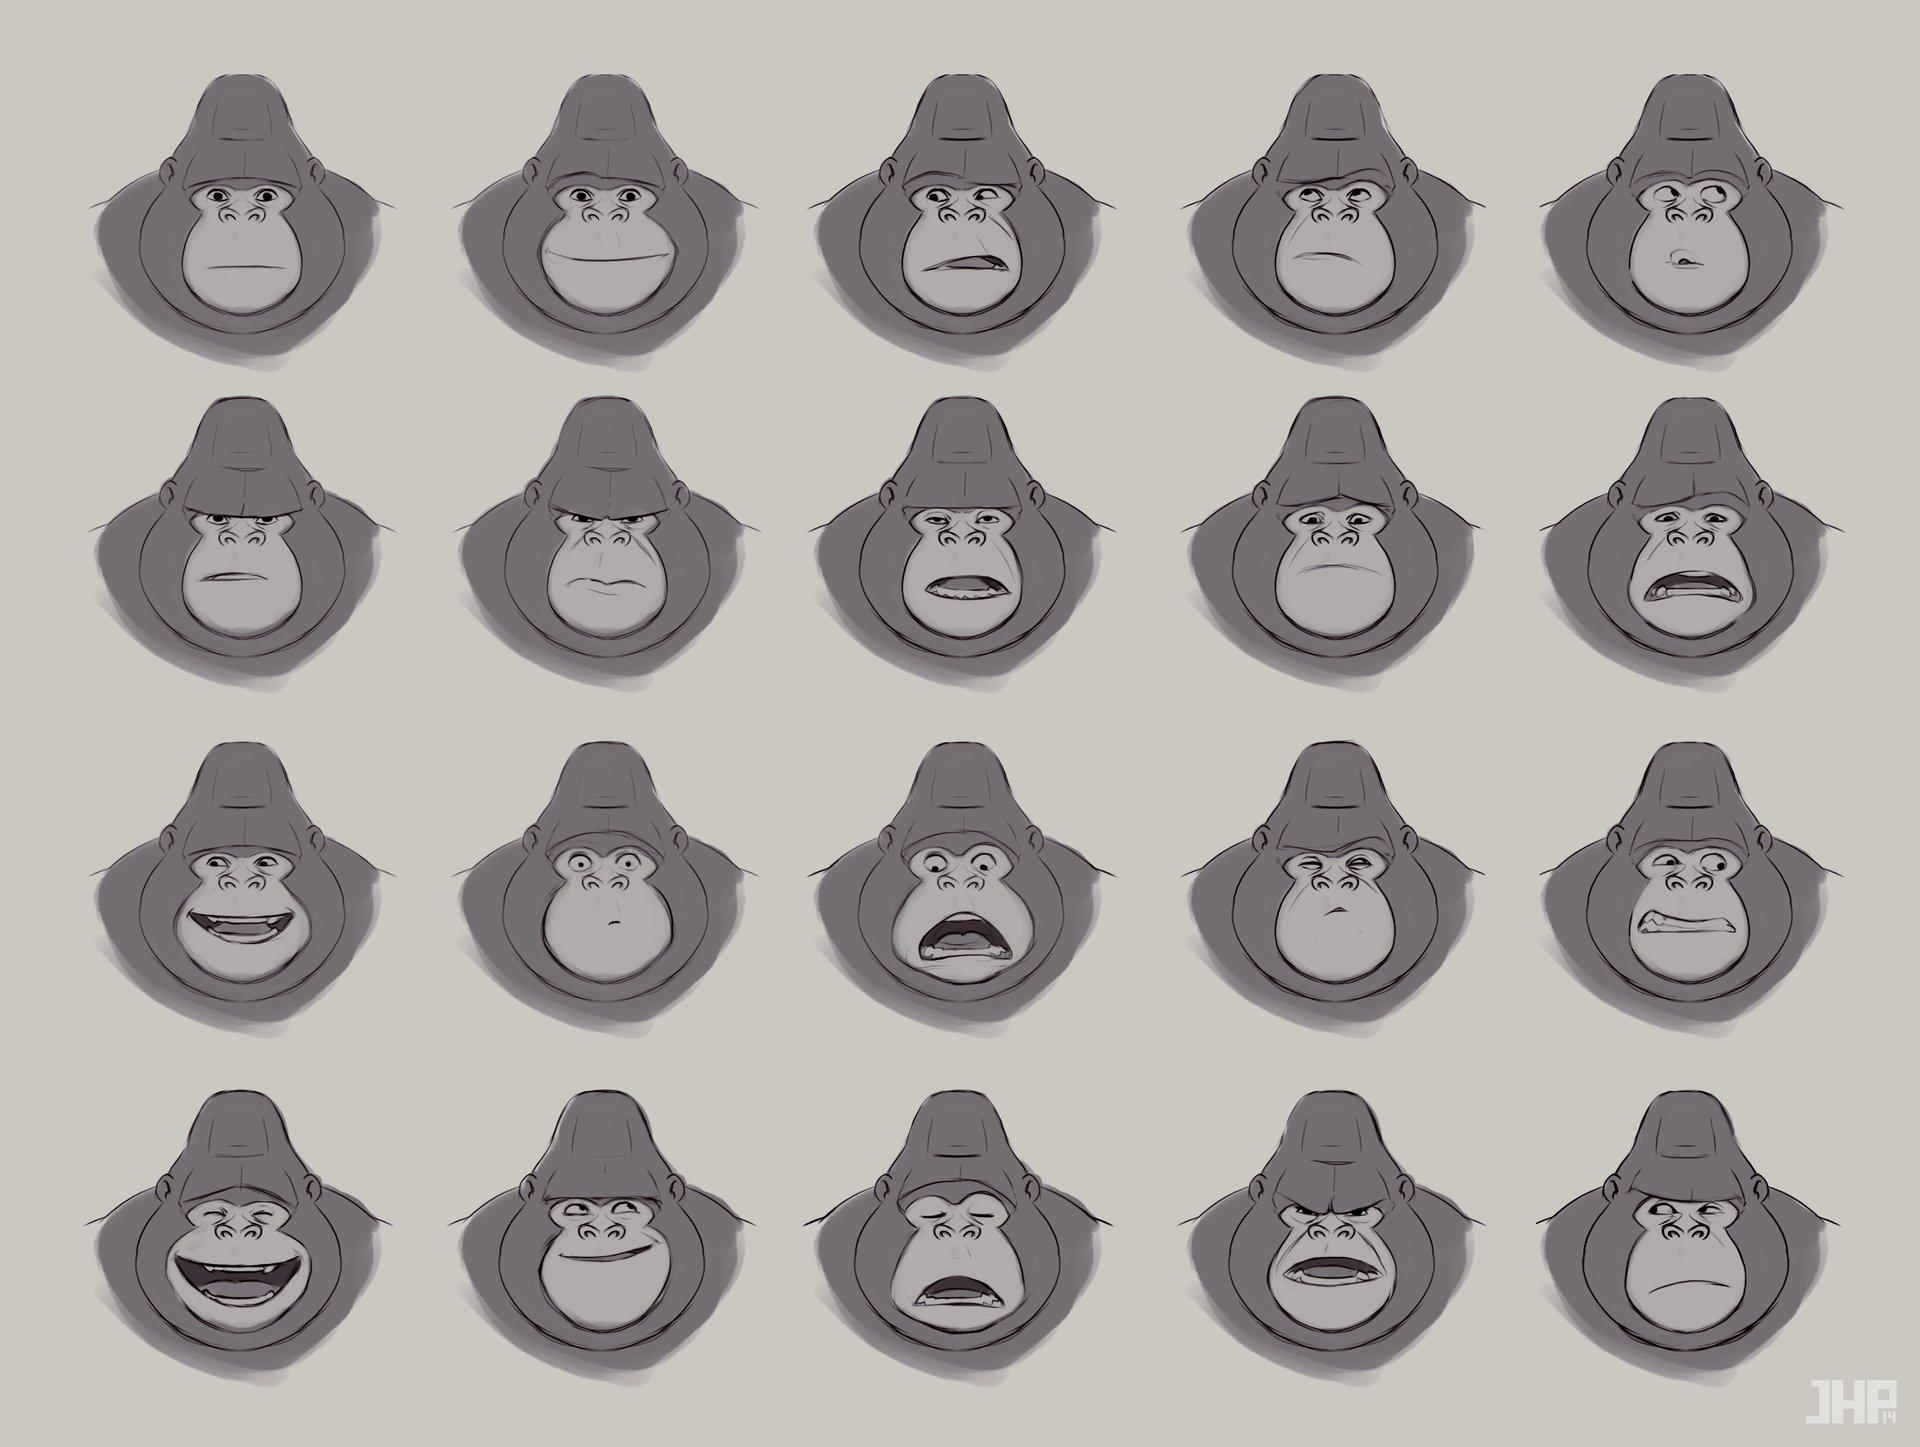 Joao henrique pacheco gorila expression sheet